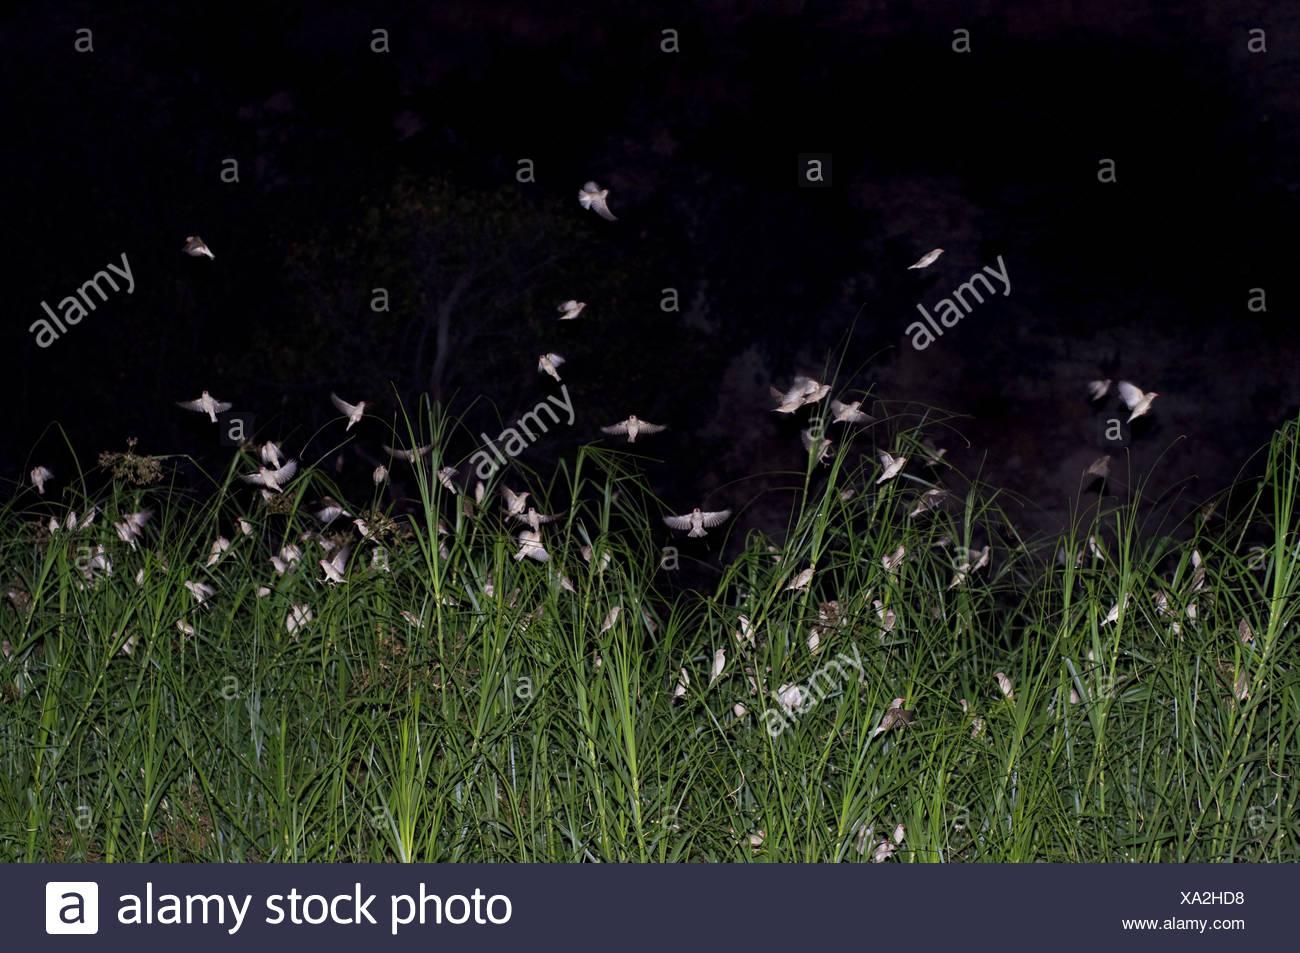 Africa, Namibia, sorgente calda, reed, uccelli, notte, oscurità, erba, erba reed, animali, bird la folla, angeblitzt, esterno, Immagini Stock